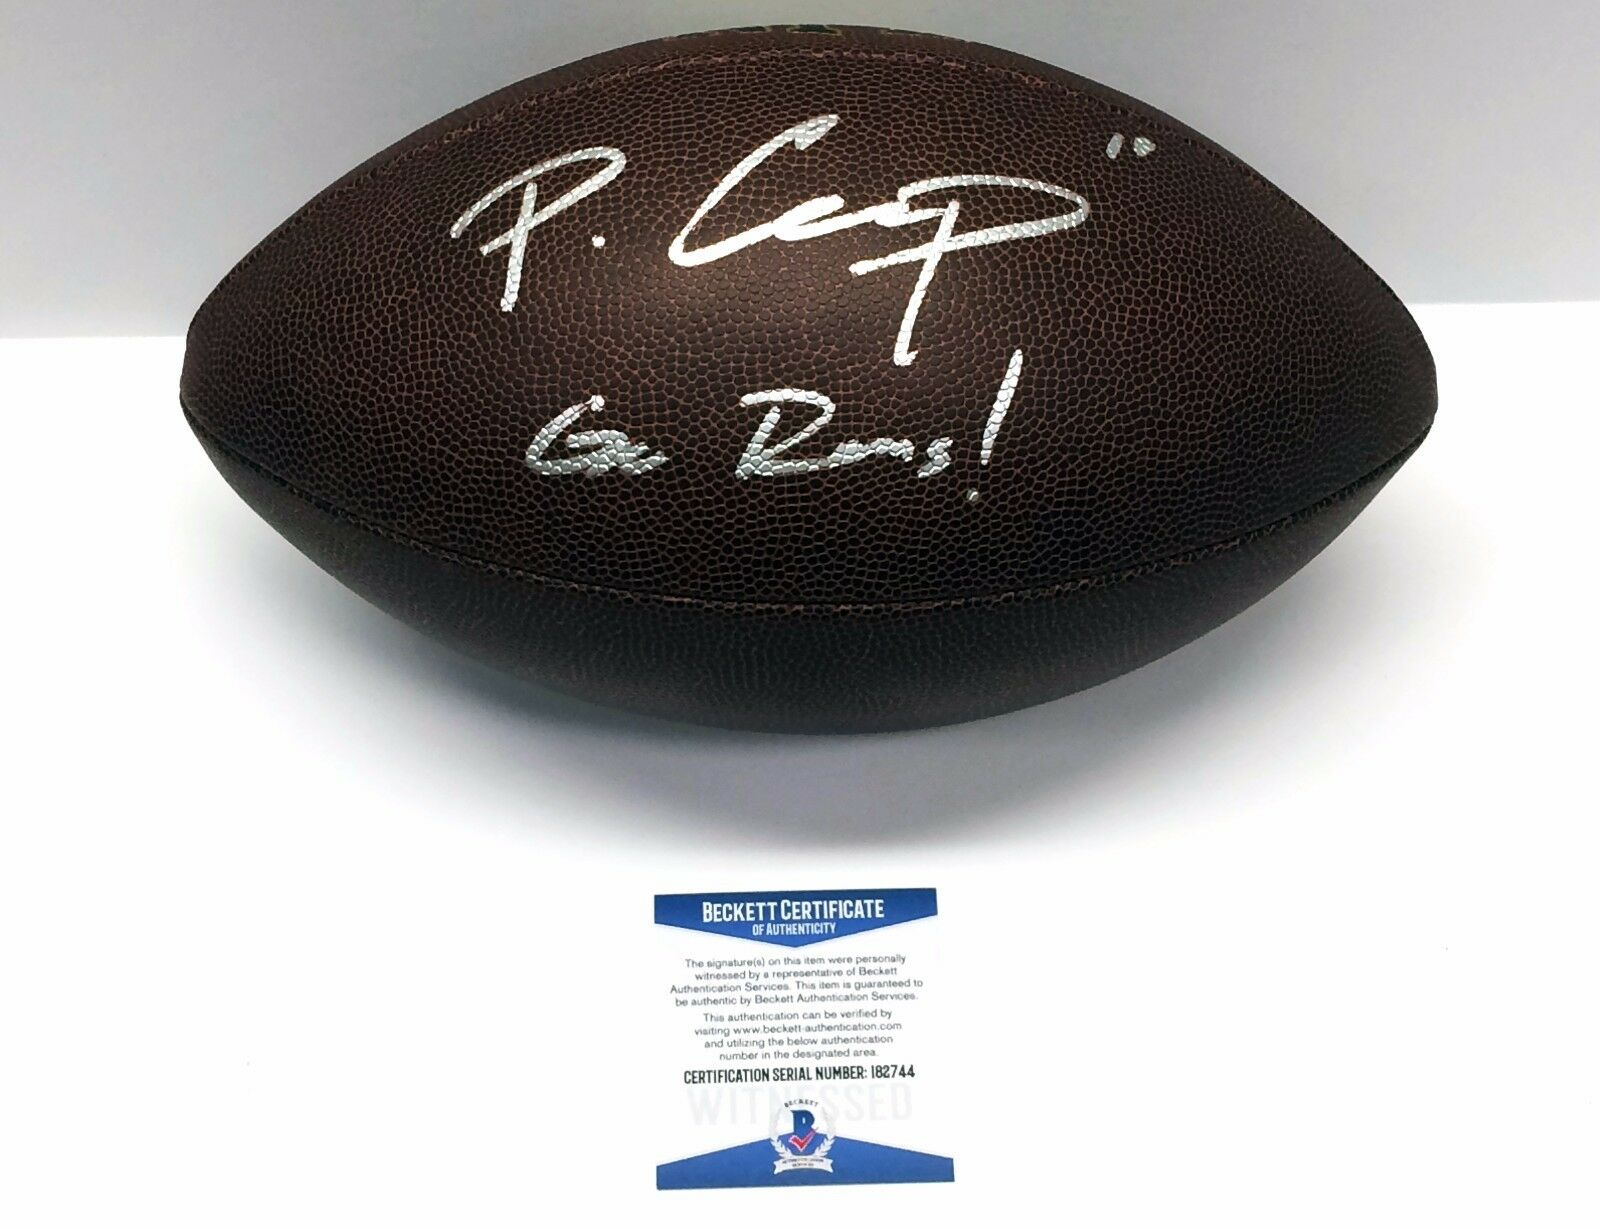 Los Angeles Rams Pharoh Cooper Signed Wilson NFL Football BAS I82744